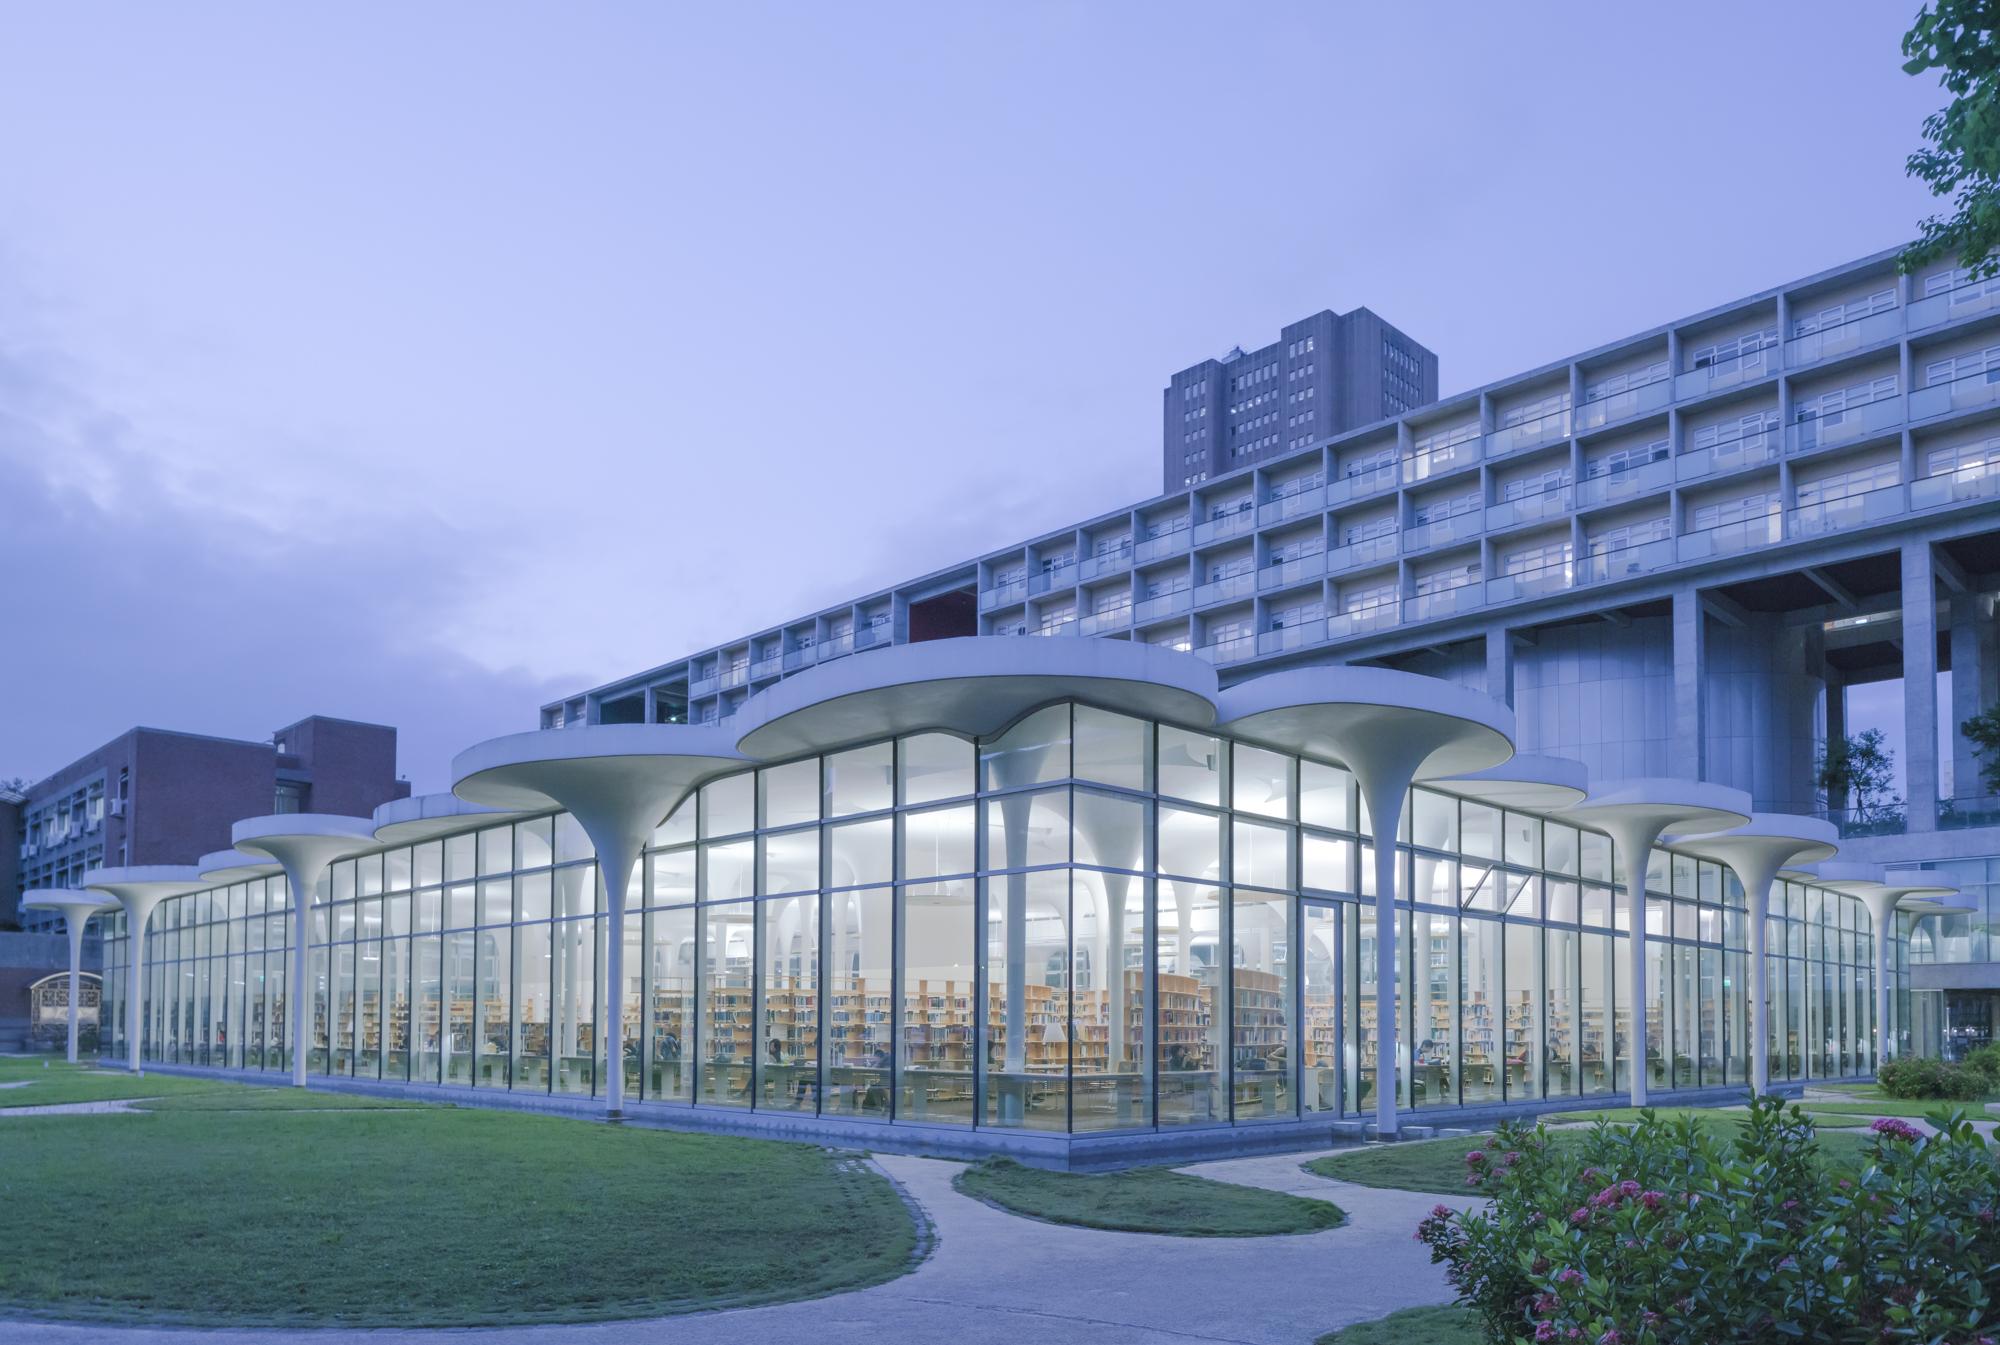 National Taiwan University— Studio Periphery